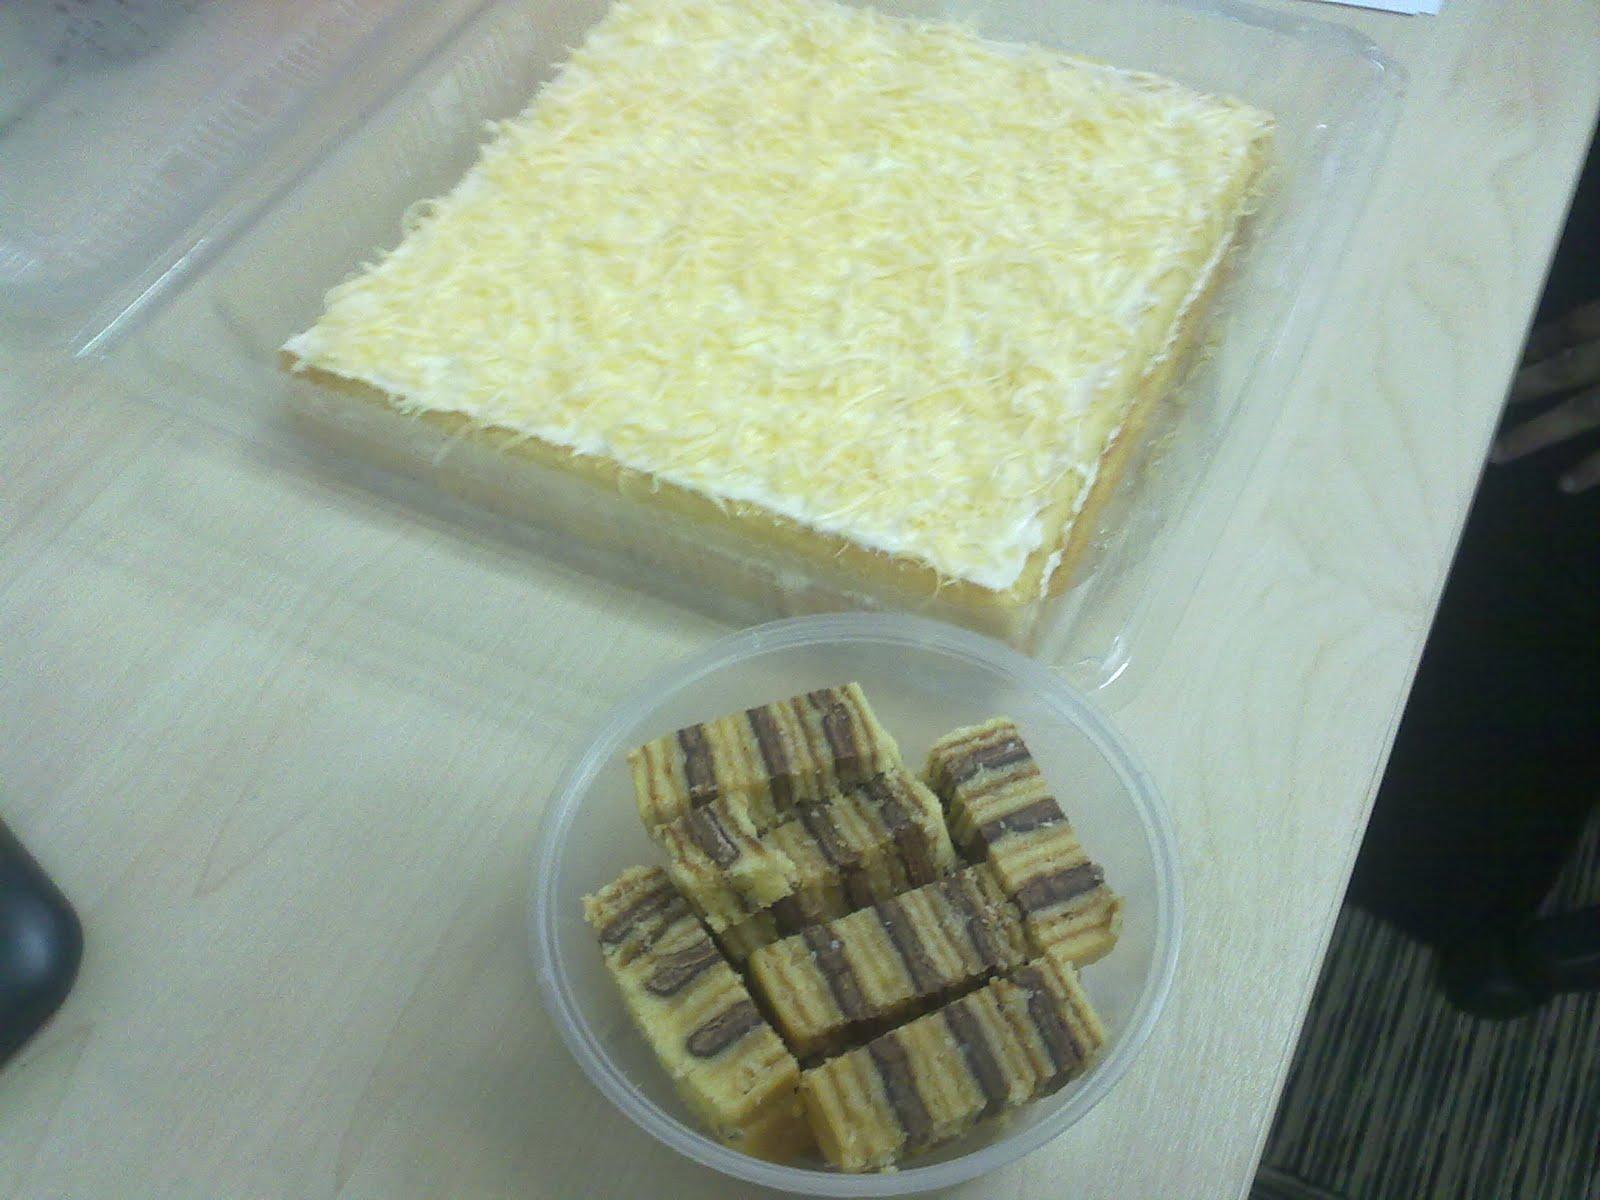 kb resepi kek batik sedap http bagaimana com my food recipe resepi kek ...